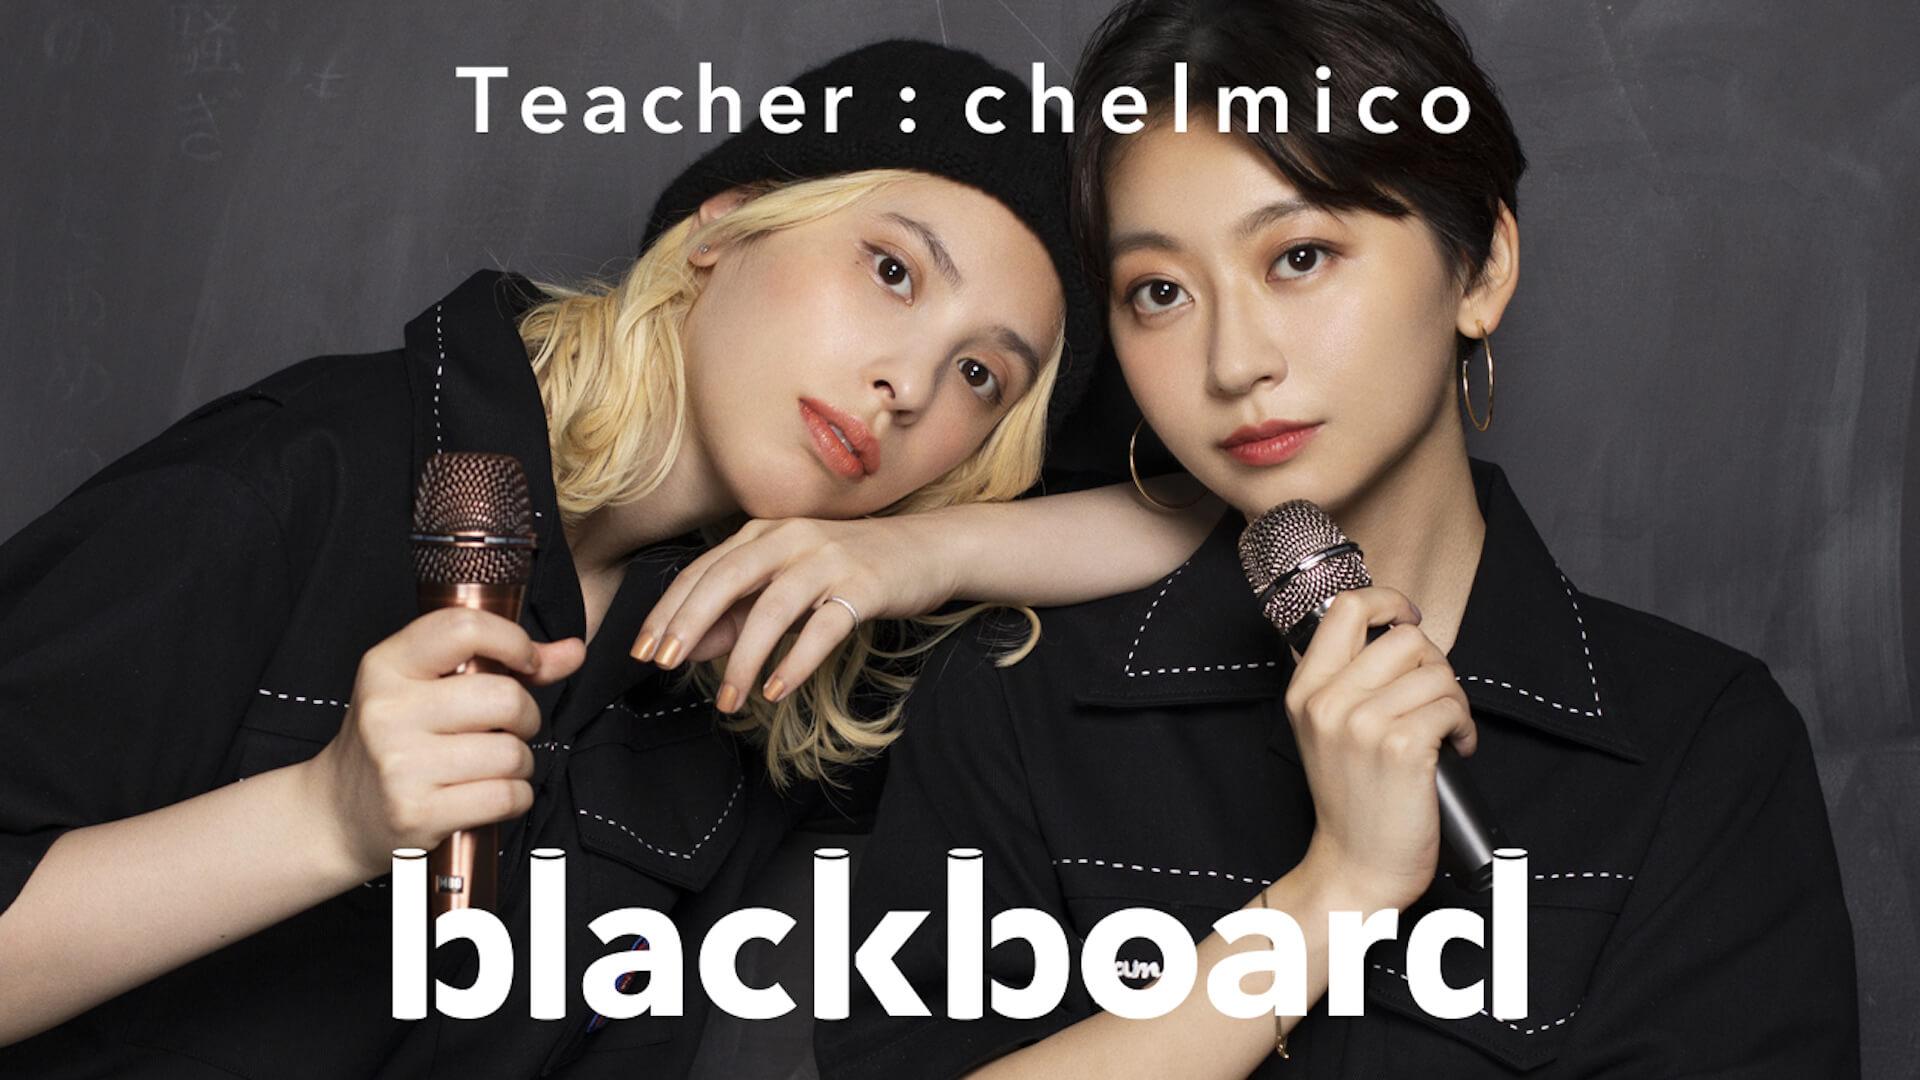 "chelmicoがYouTubeチャンネル「blackboard」で再び先生に!『maze』収録の楽曲""Terminal 着、即 Dance (blackboard version)""をライブ歌唱 music200930_chelmico_2"